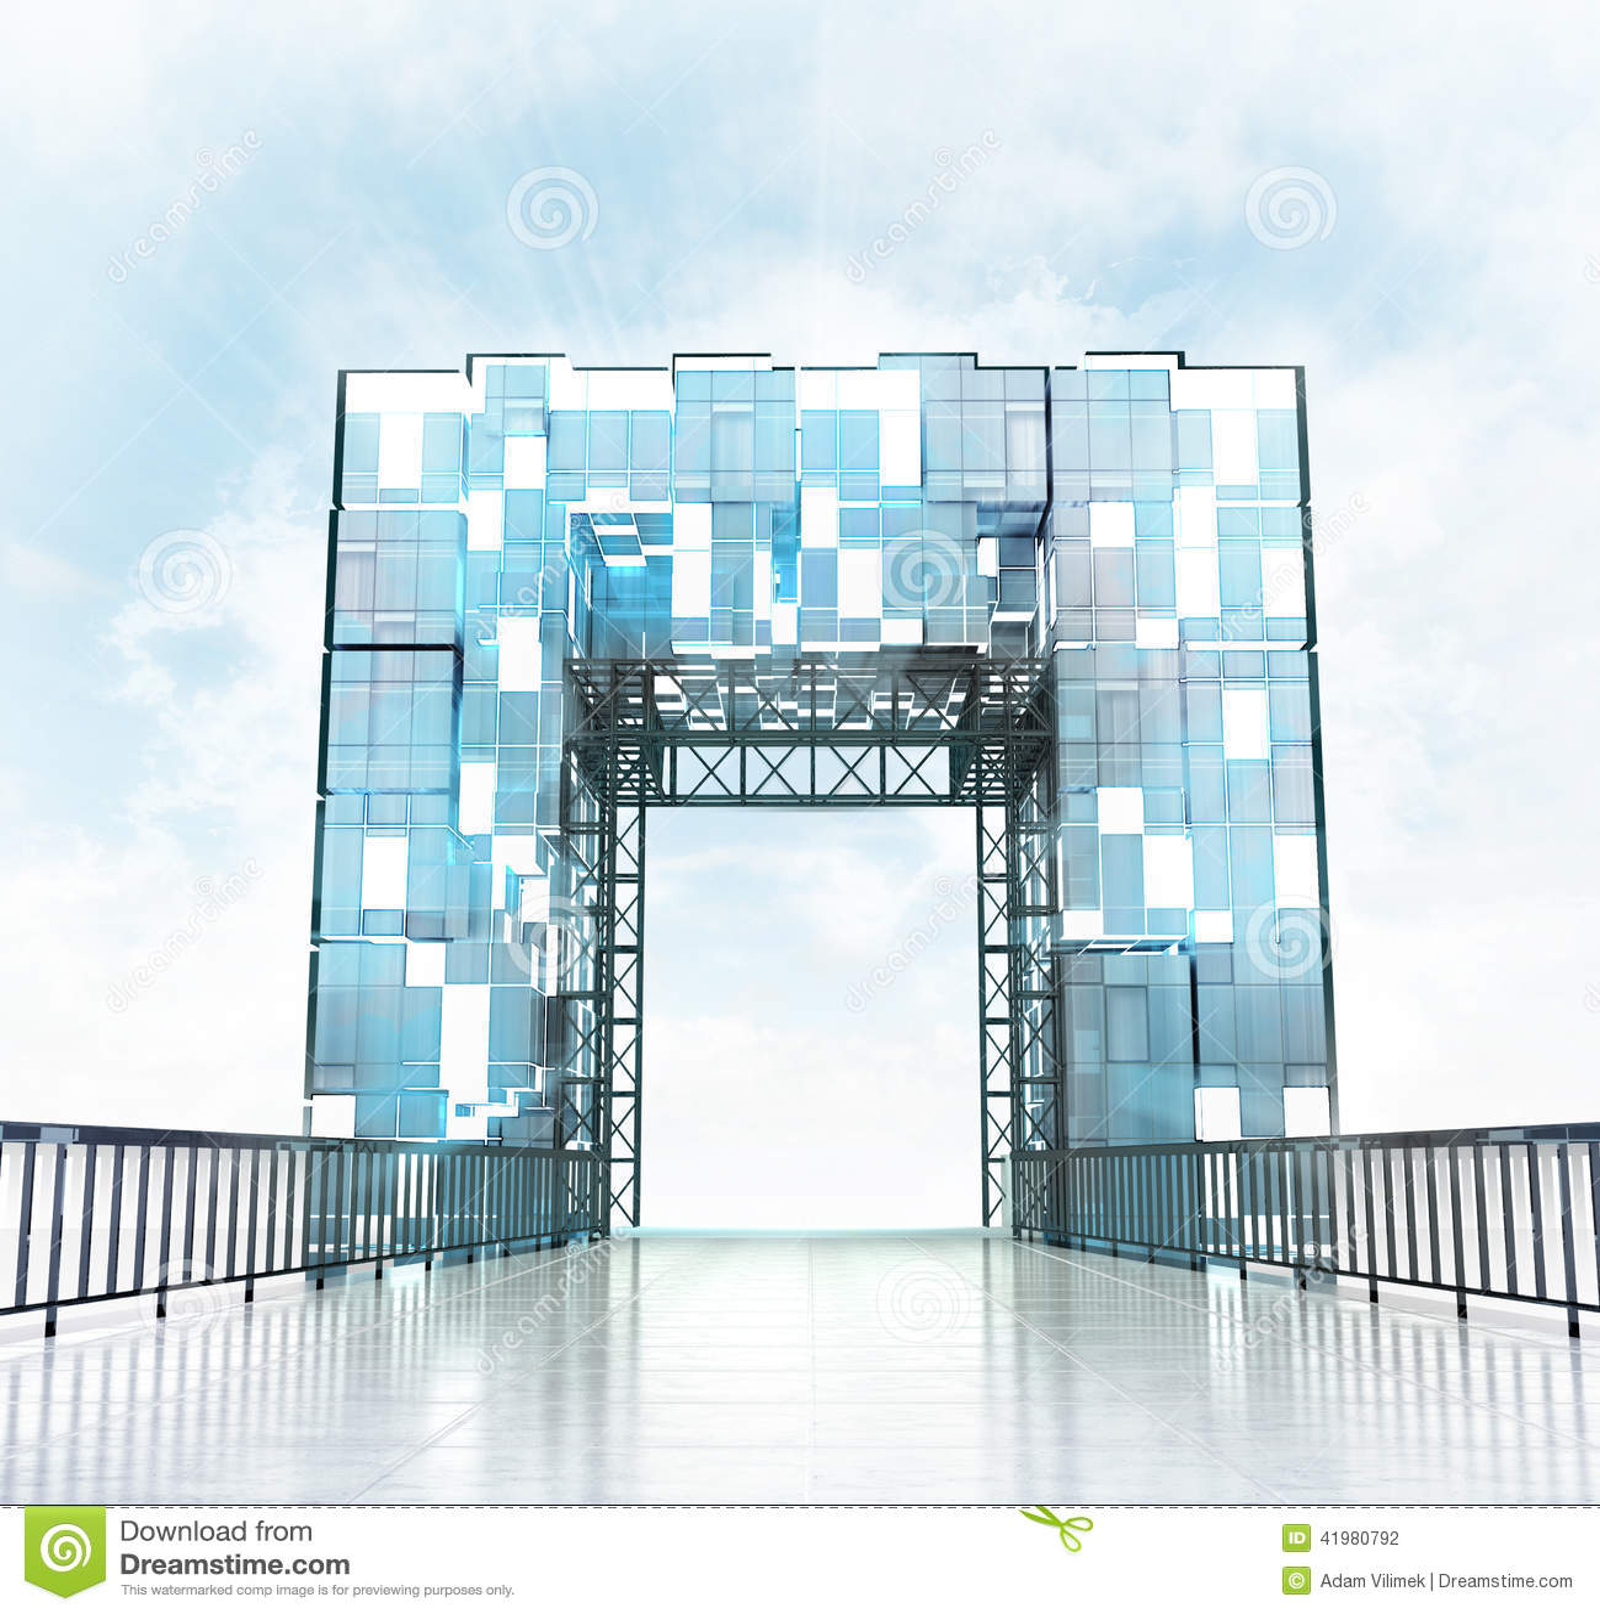 Grand entrance through modern gateway architecture stock for Home gateway architecture